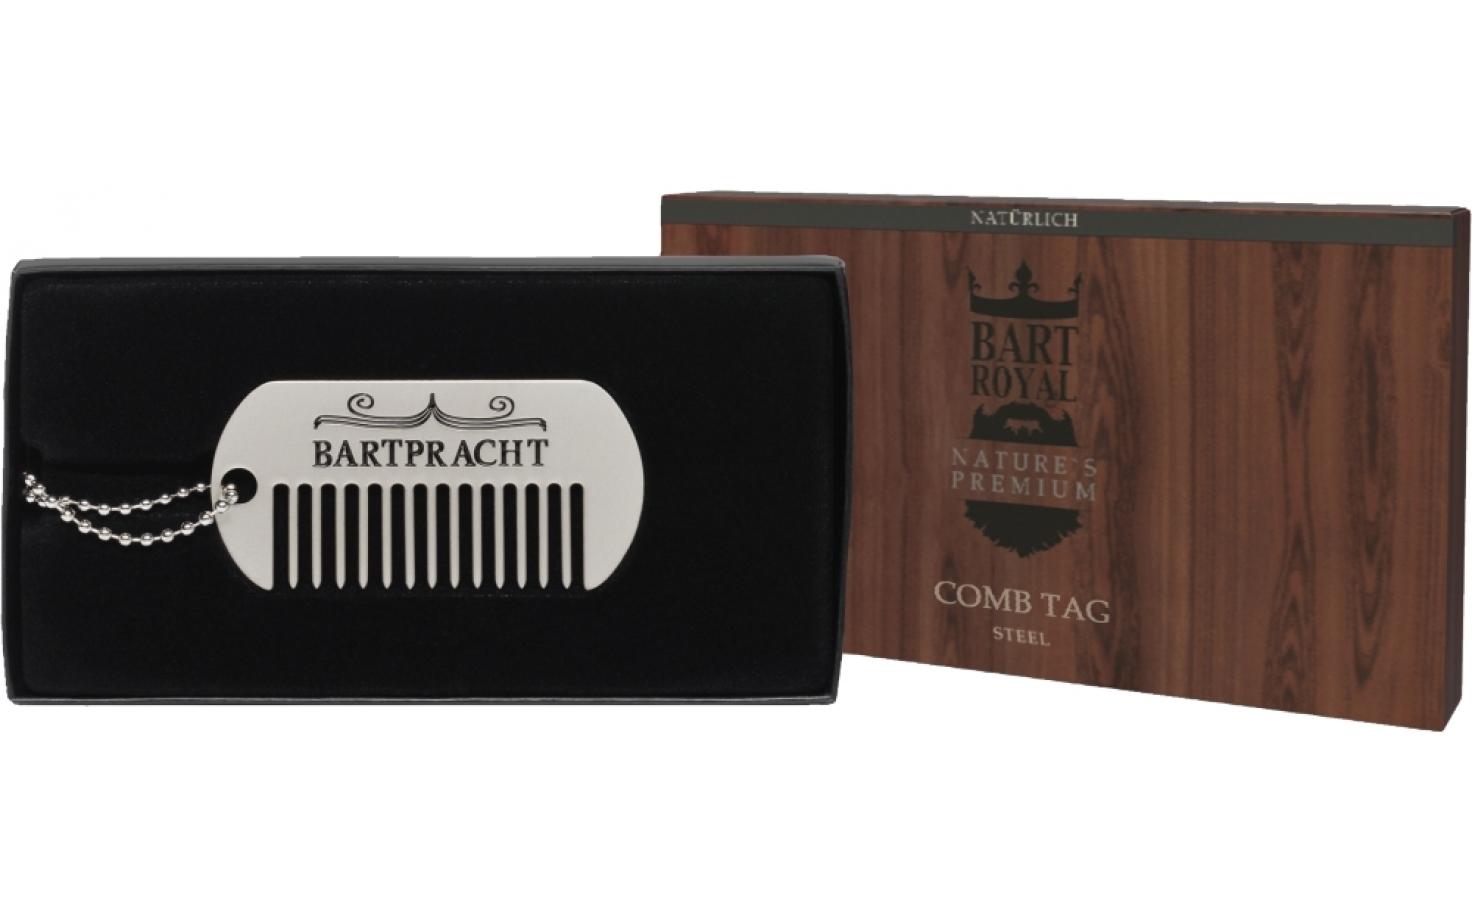 Bart Royal Nature's Premium Comb Tag